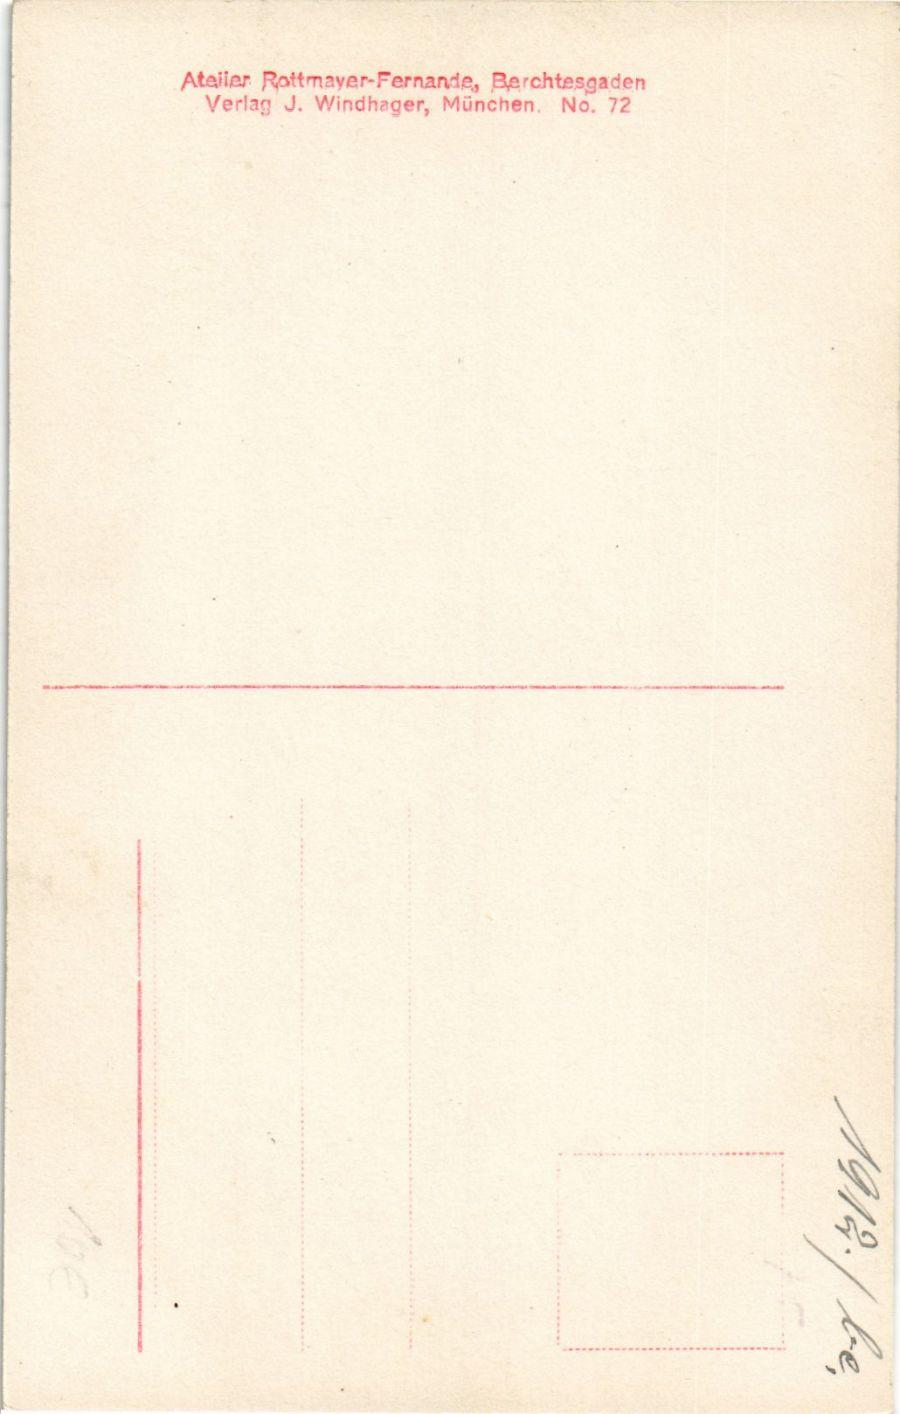 CPA-AK-Prinz-Luitpold-u-Albrecht-v-Bayern-GERMAN-ROYALTY-867609 Indexbild 2